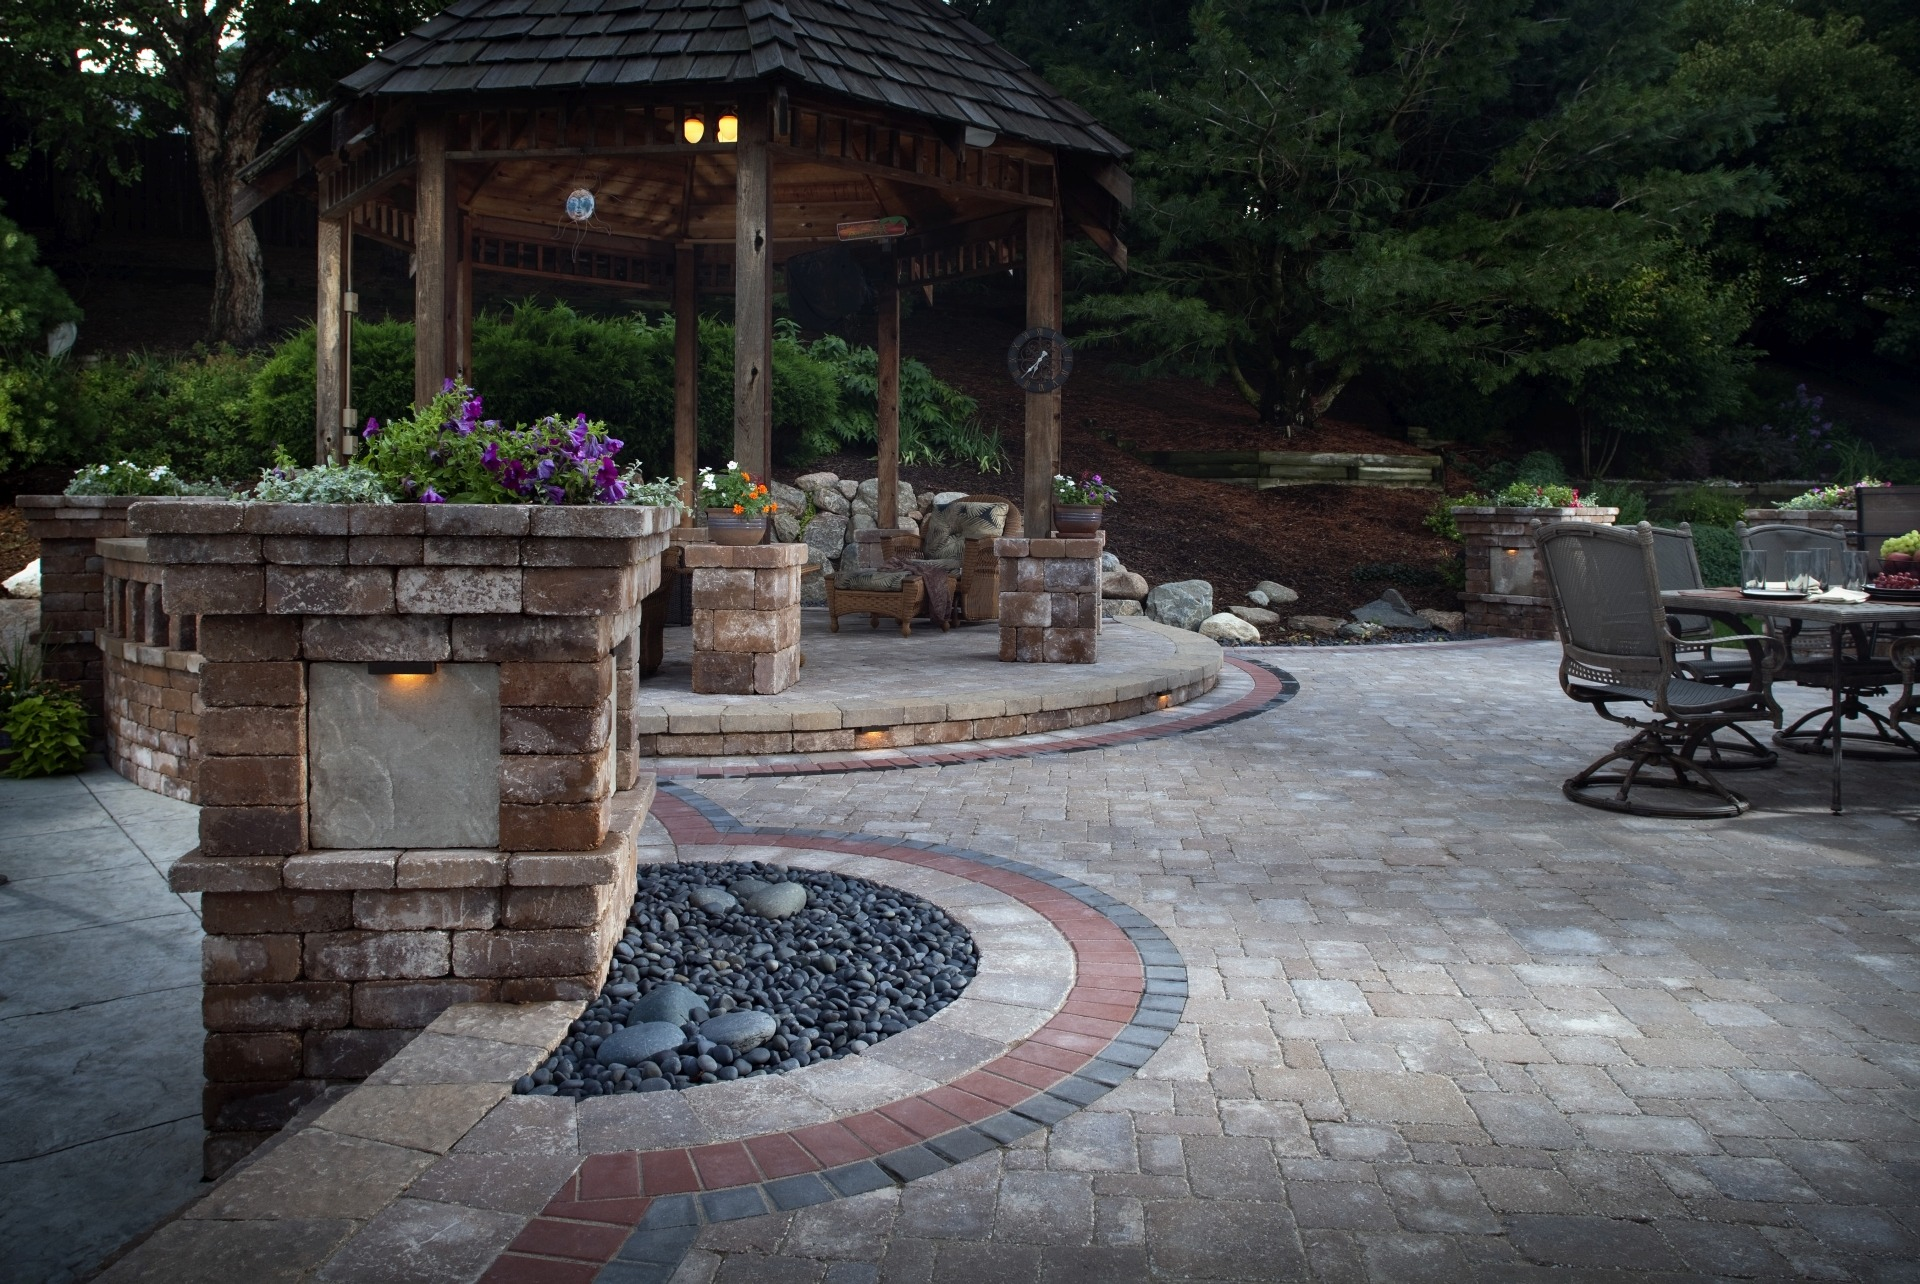 Paving Stone Patio with Seating Areas